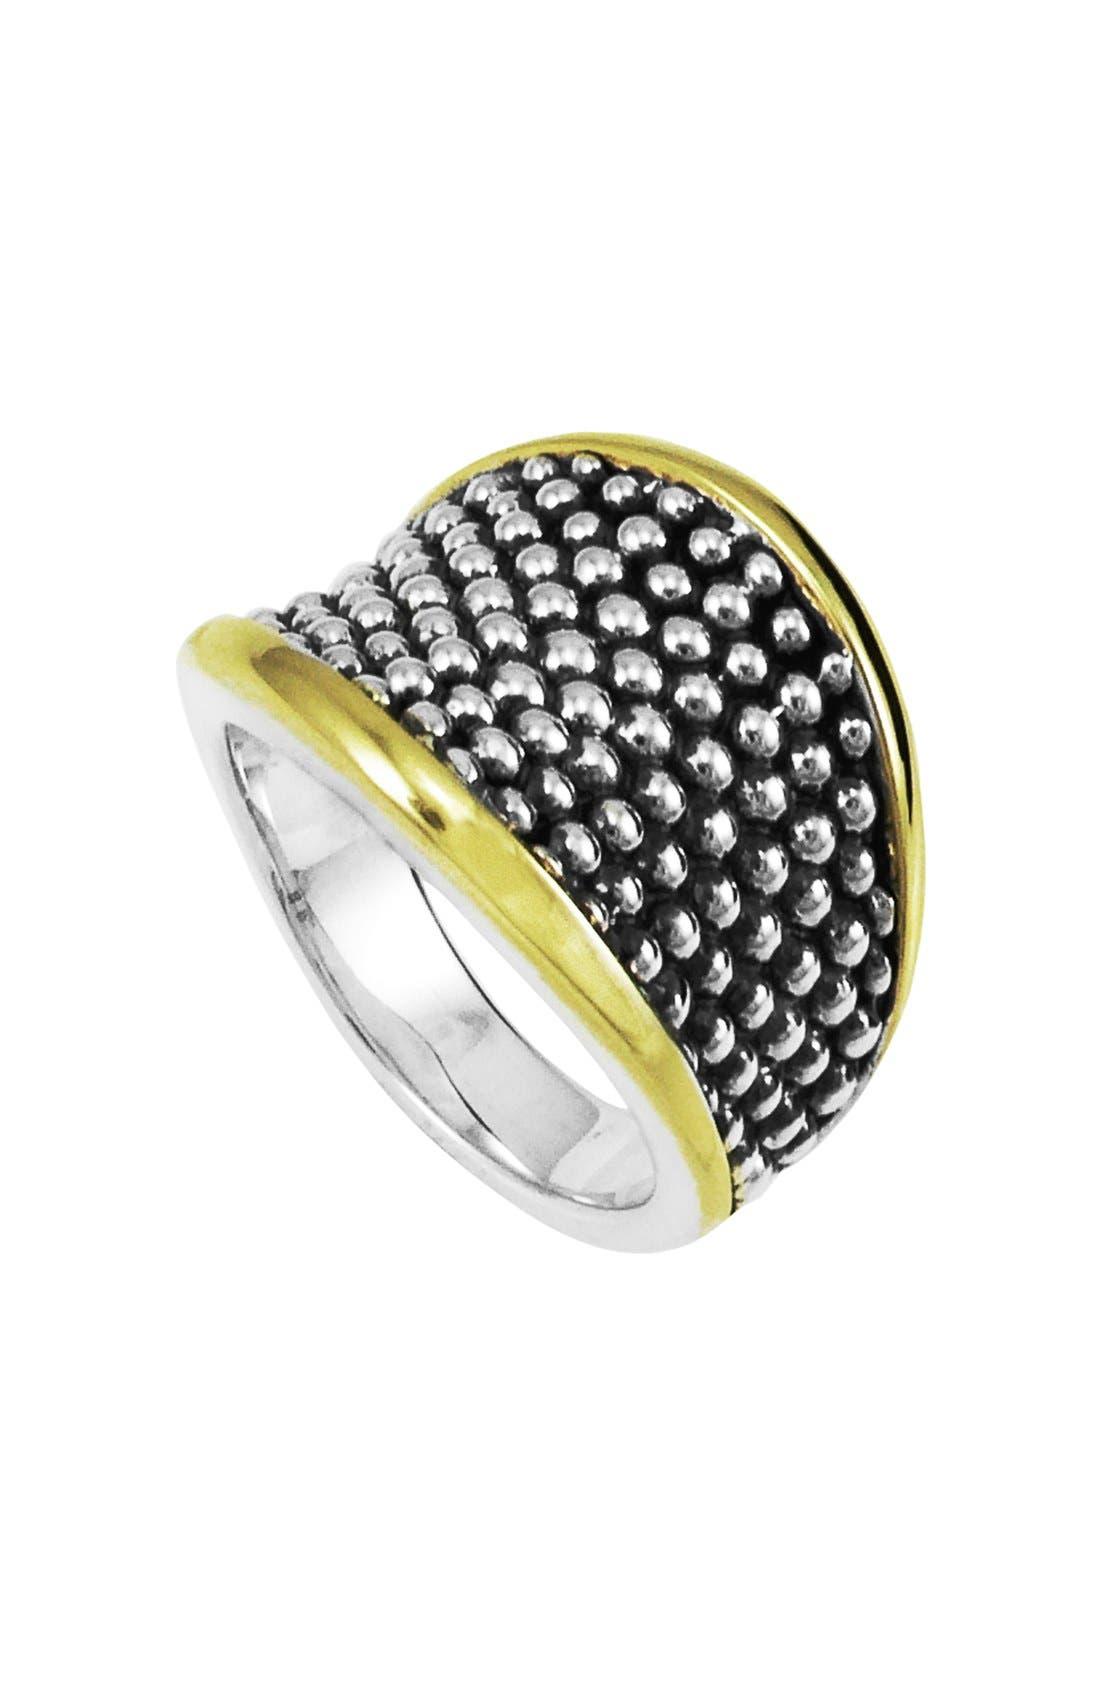 Main Image - LAGOS Caviar Ring